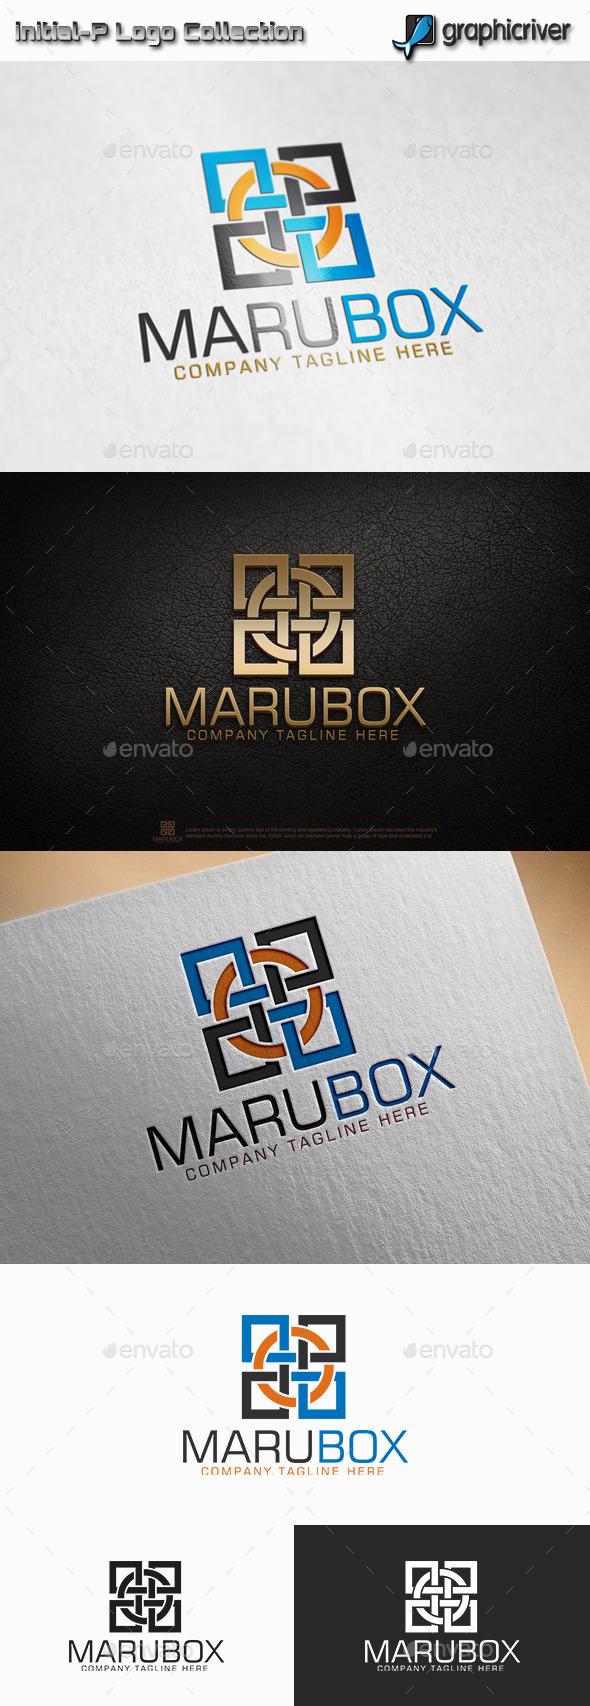 Maru Box - Circle Square logo